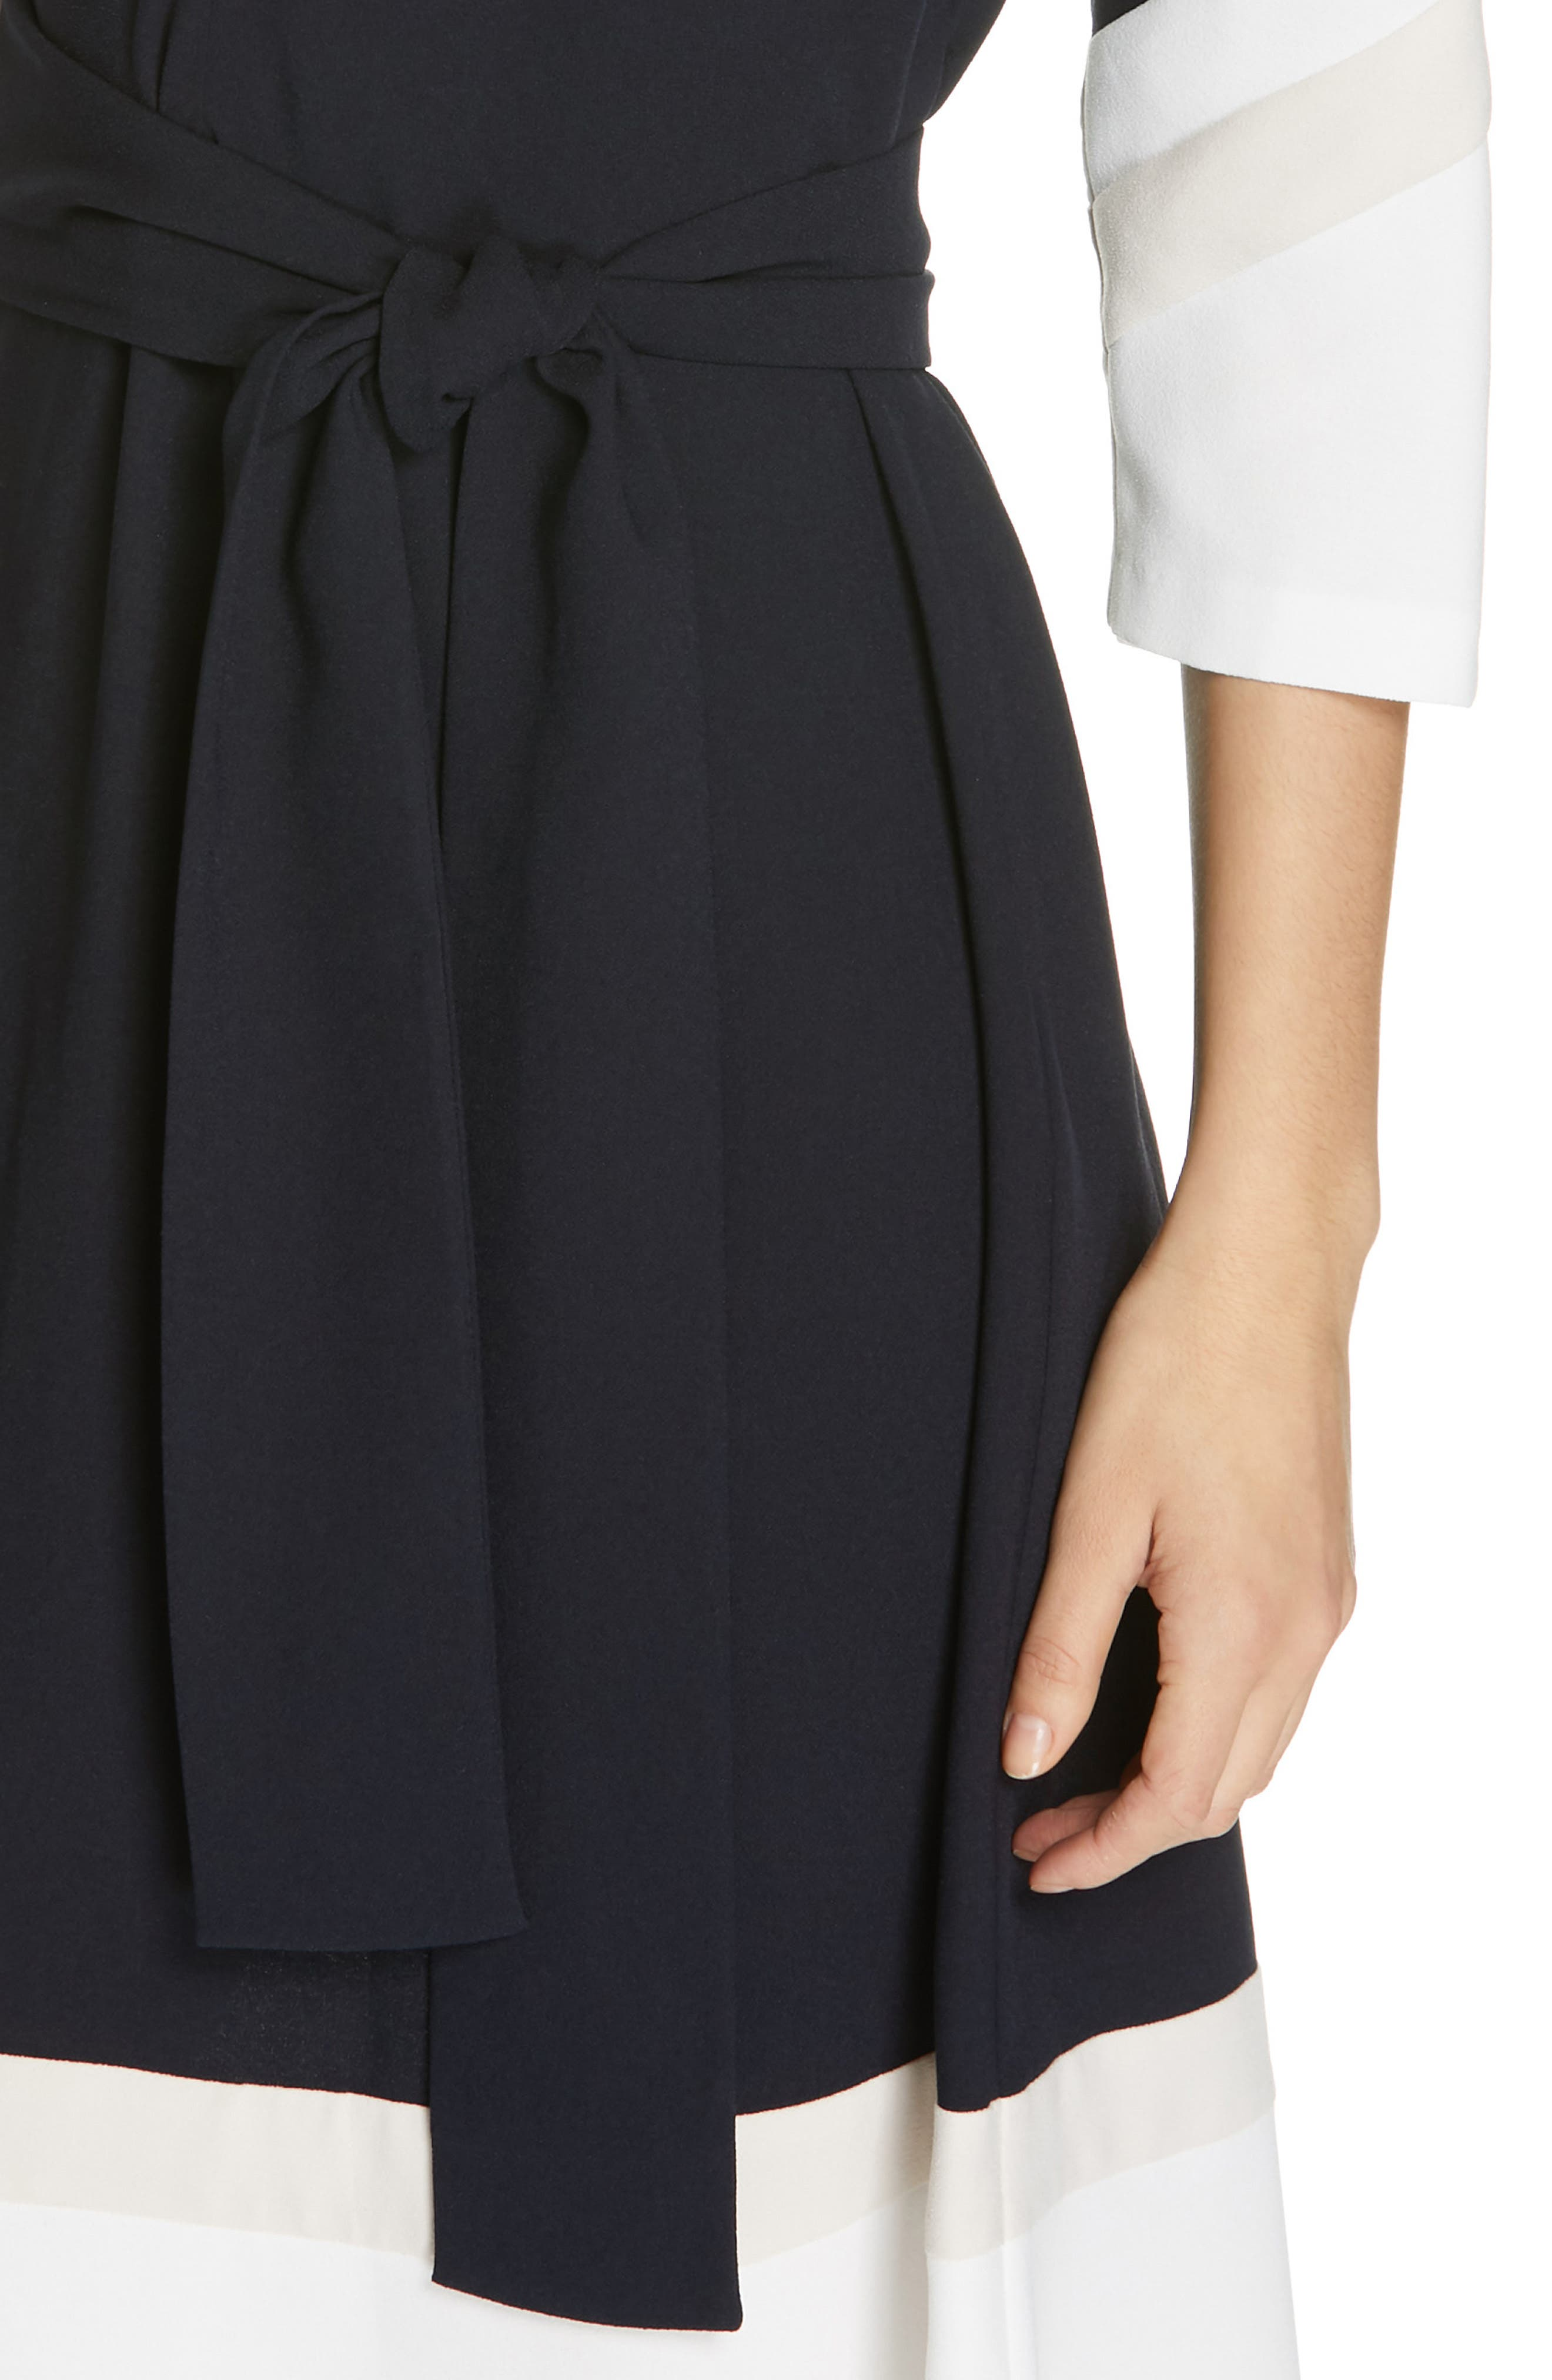 Aydrien Colorblock Dress,                             Alternate thumbnail 4, color,                             MID PORCELAIN-PINK SKY